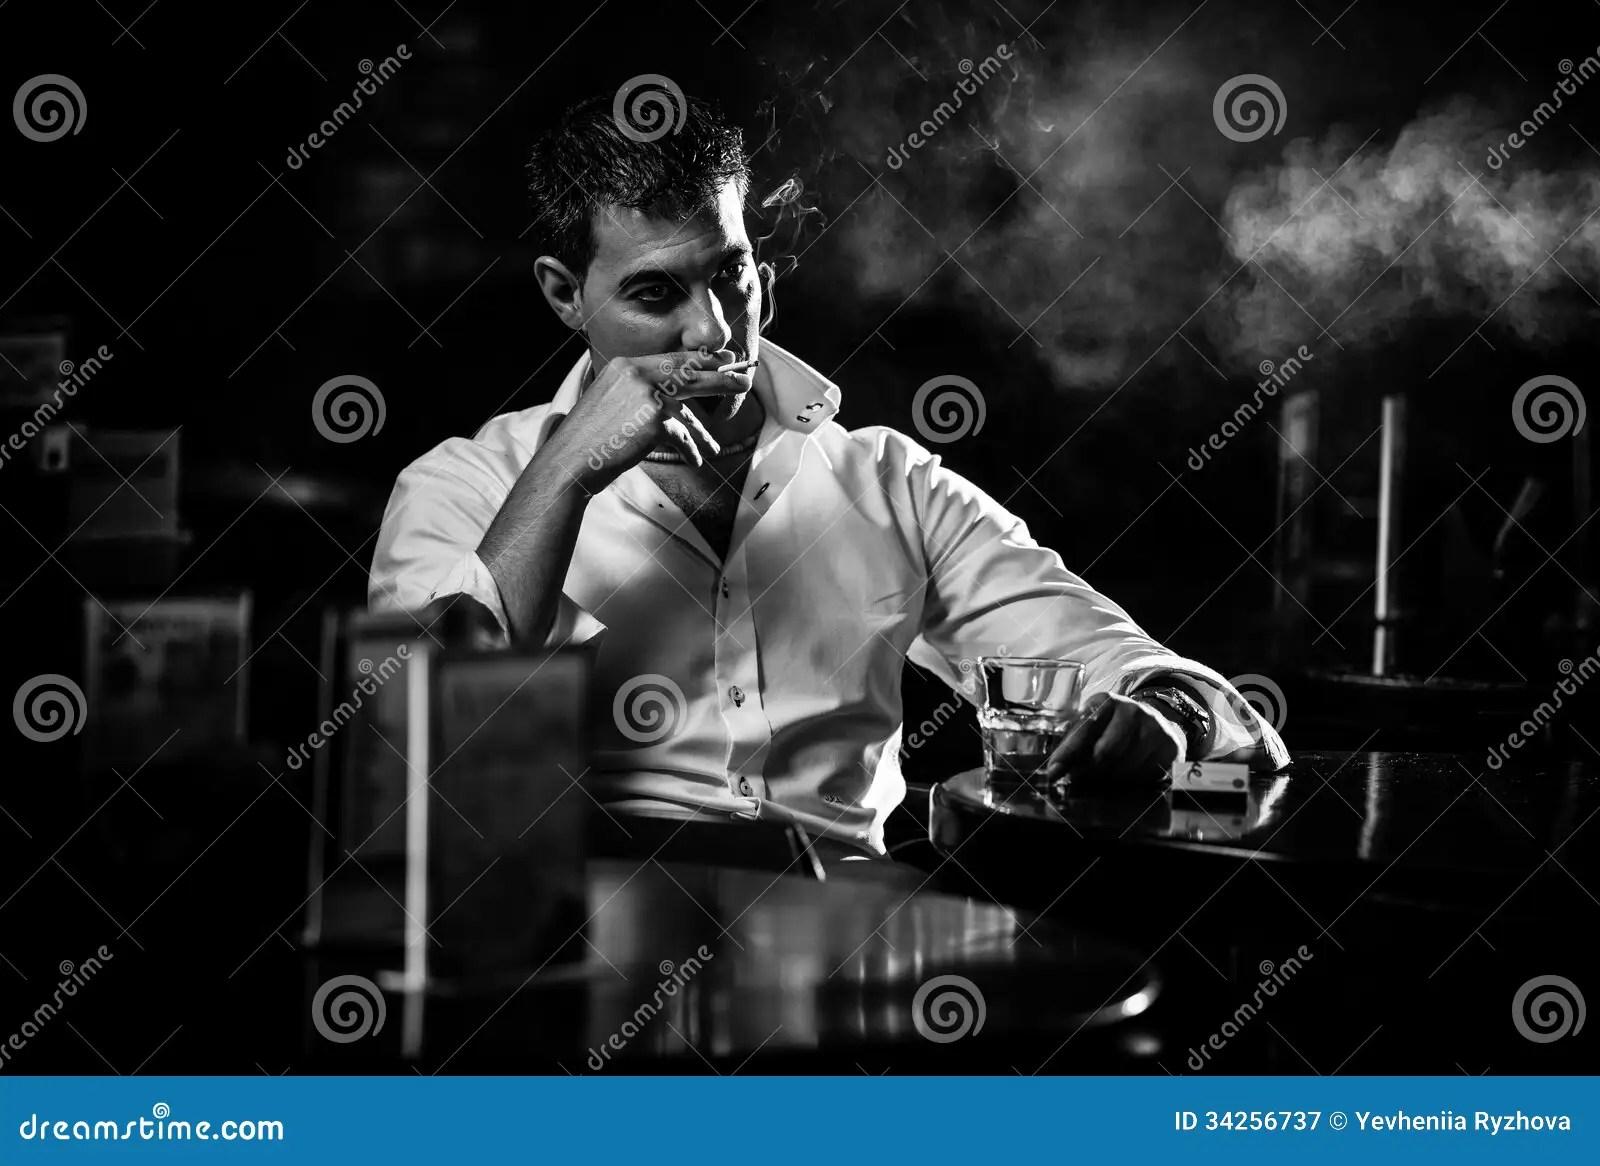 Alone Girl Wallpaper Hd Download Man Smoking Cigarette In Restaurant Stock Image Image